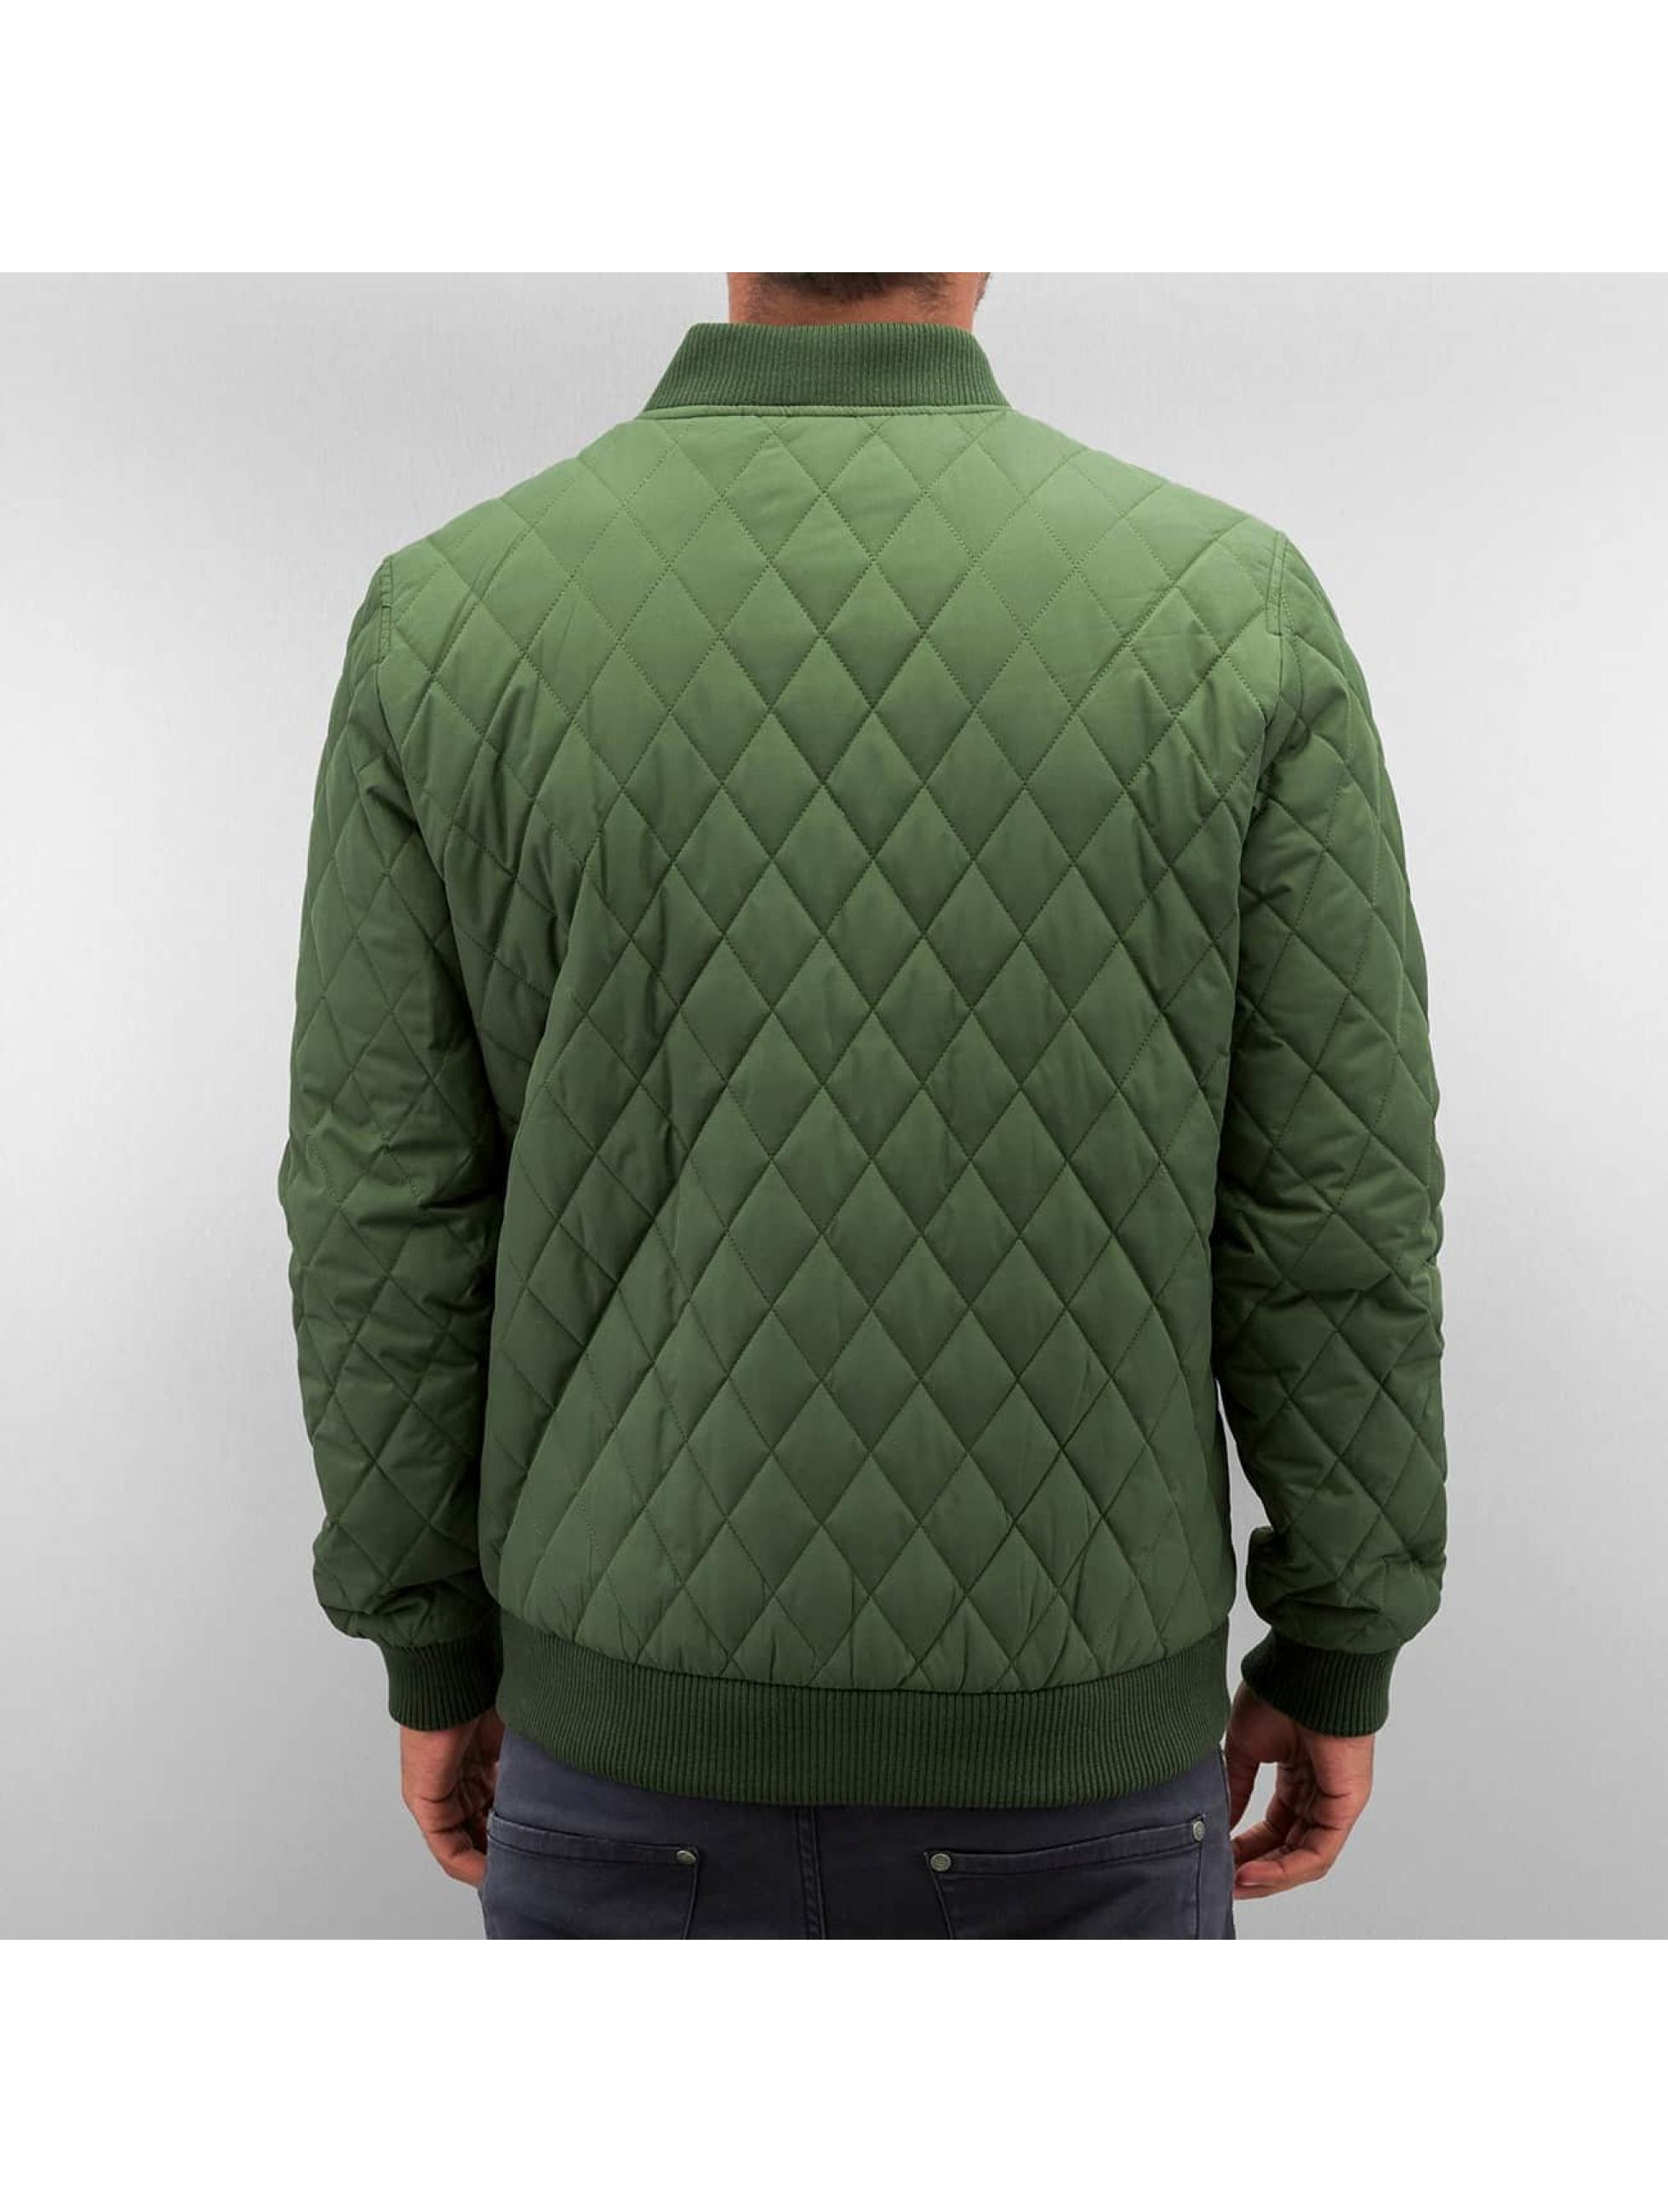 Cyprime Lightweight Jacket Quilted olive